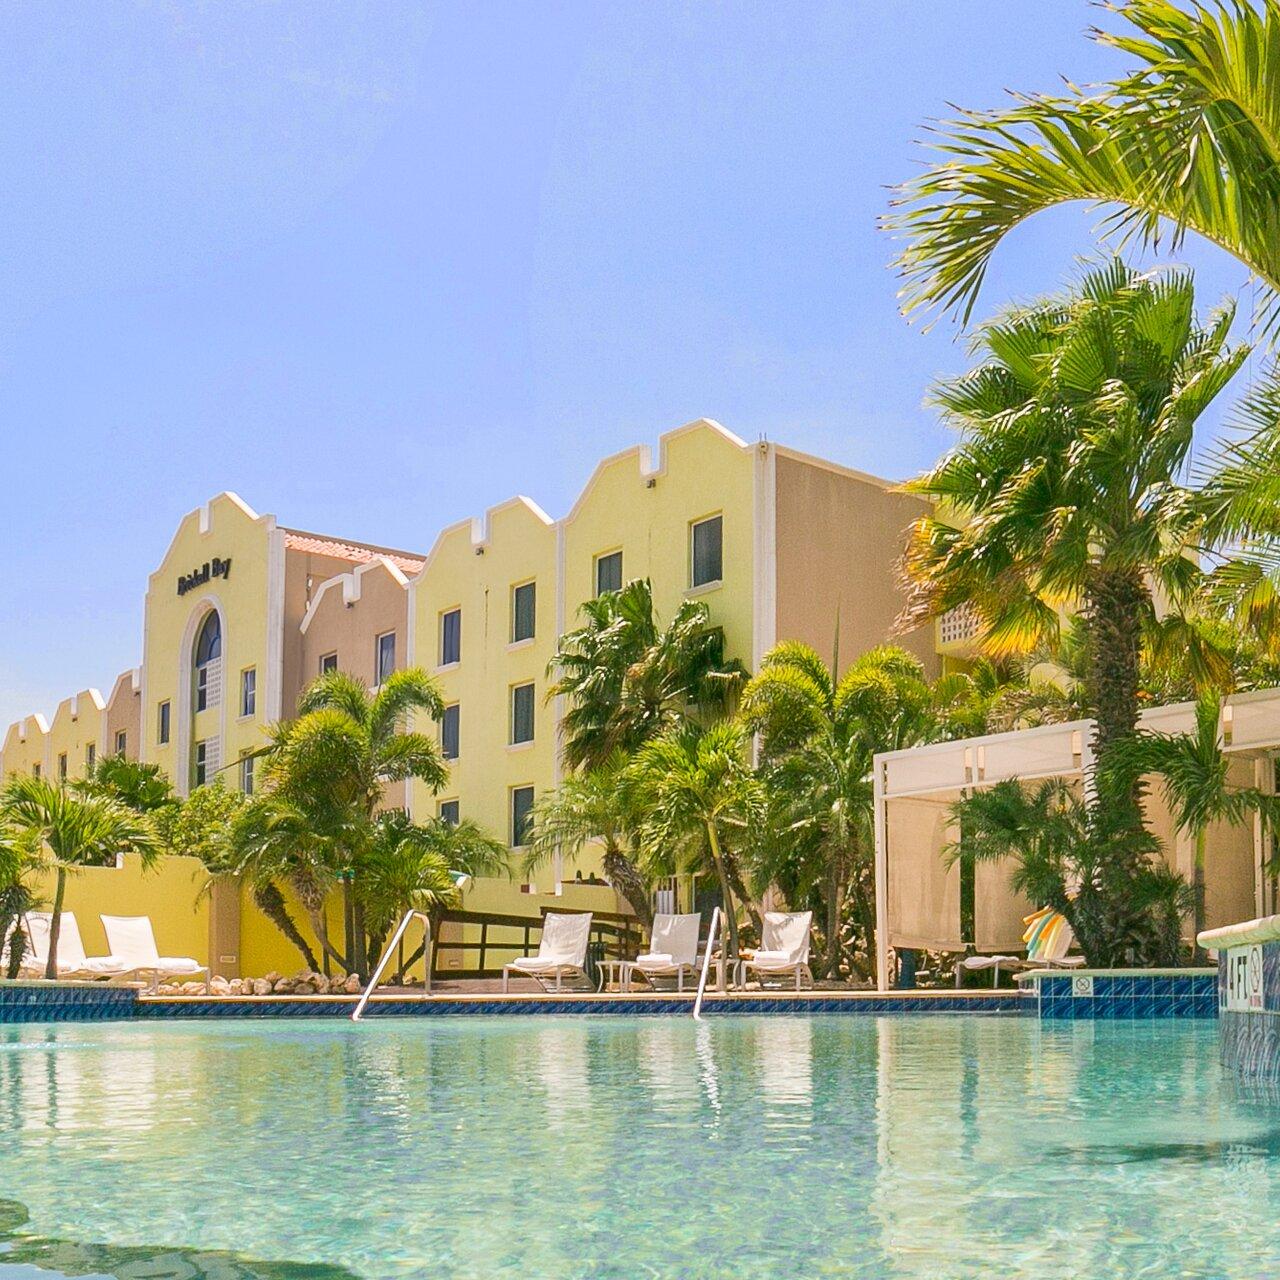 Luxurious Boutique Hotels In Palm Beach Aruba Brickell Bay Club Spa